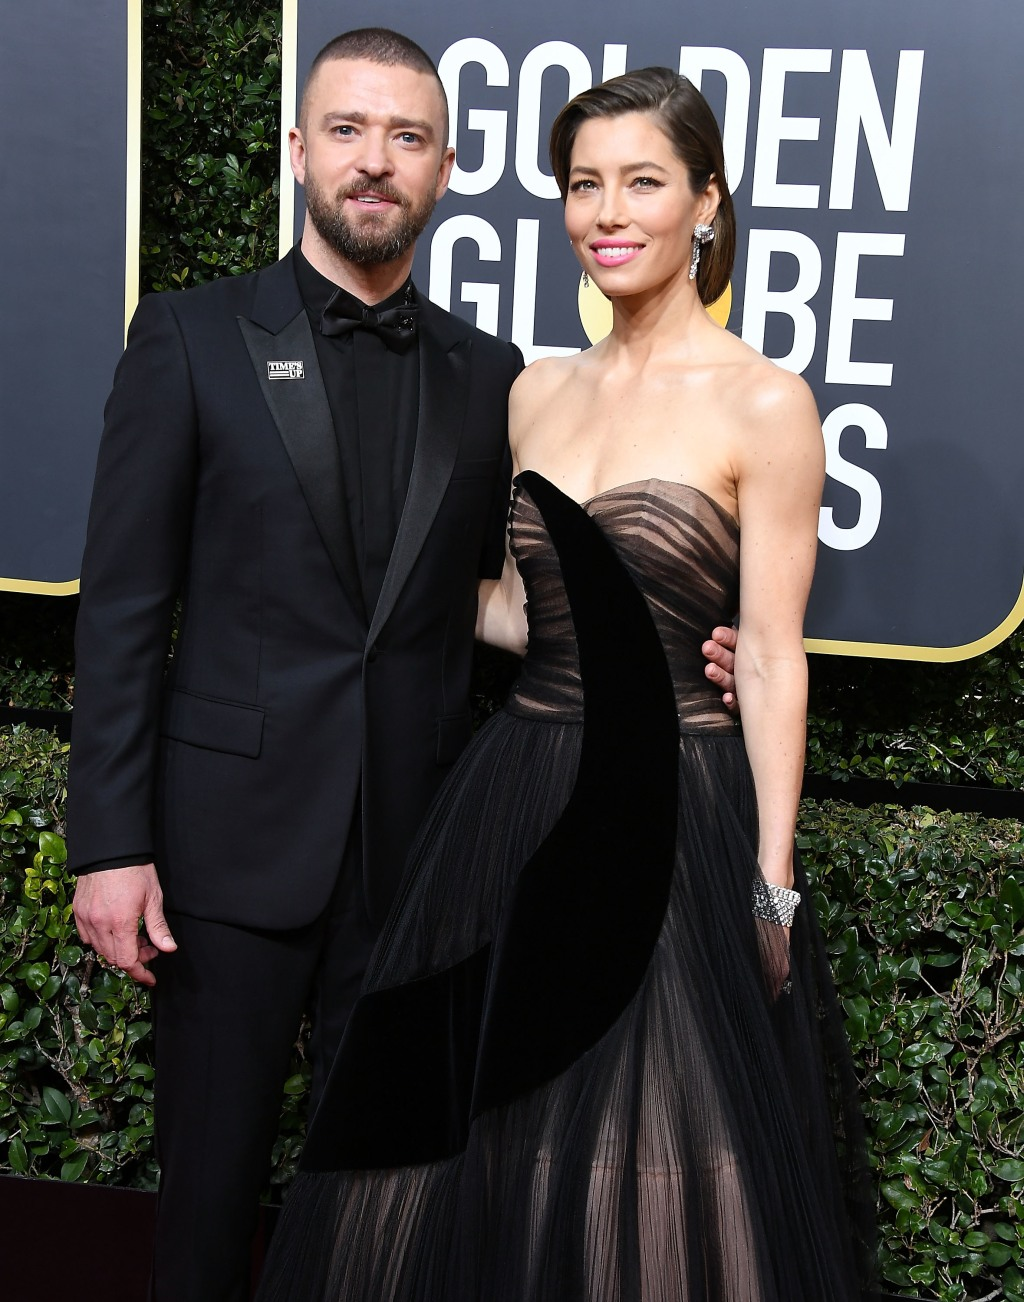 Justin Timberlake, Jessica Biel, Golden Globes